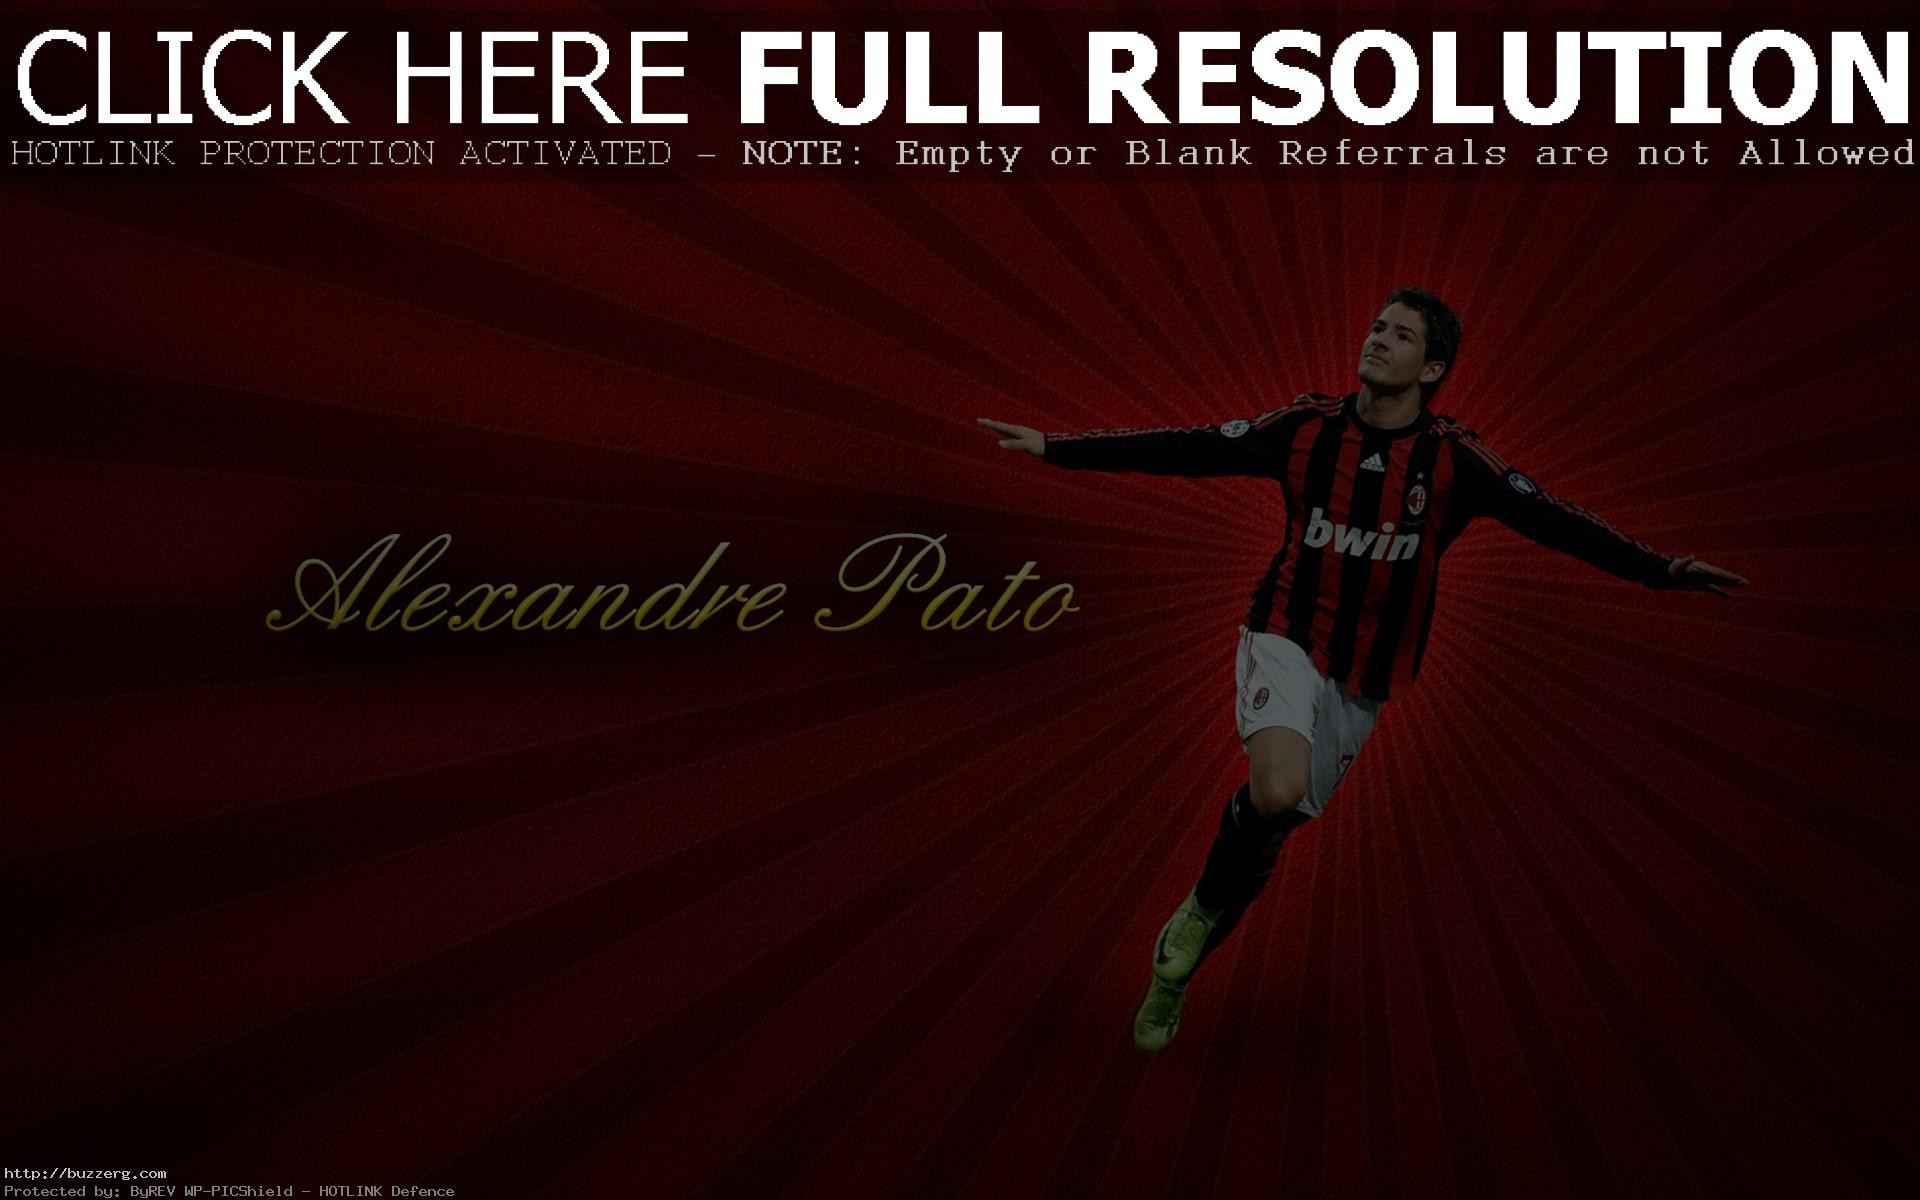 Alexandre Pato Ac Milan (id: 190471)